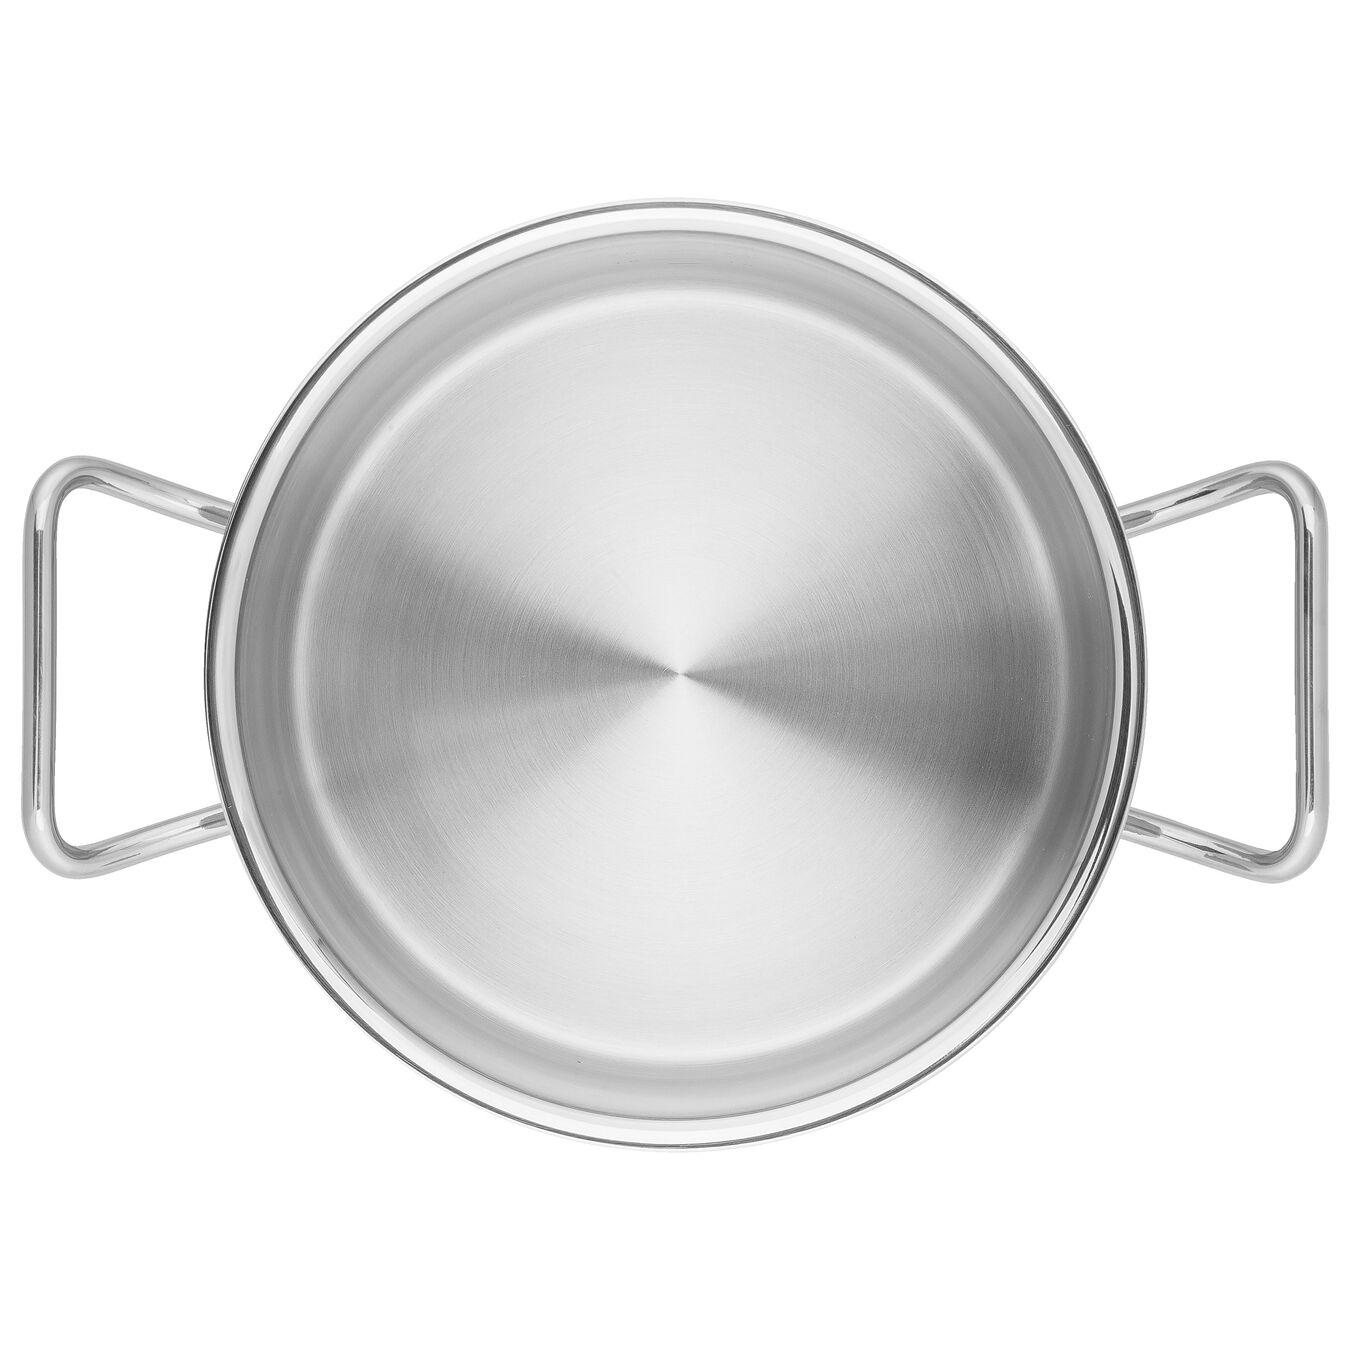 Gryta hög 24 cm, 18/10 Rostfritt stål,,large 6